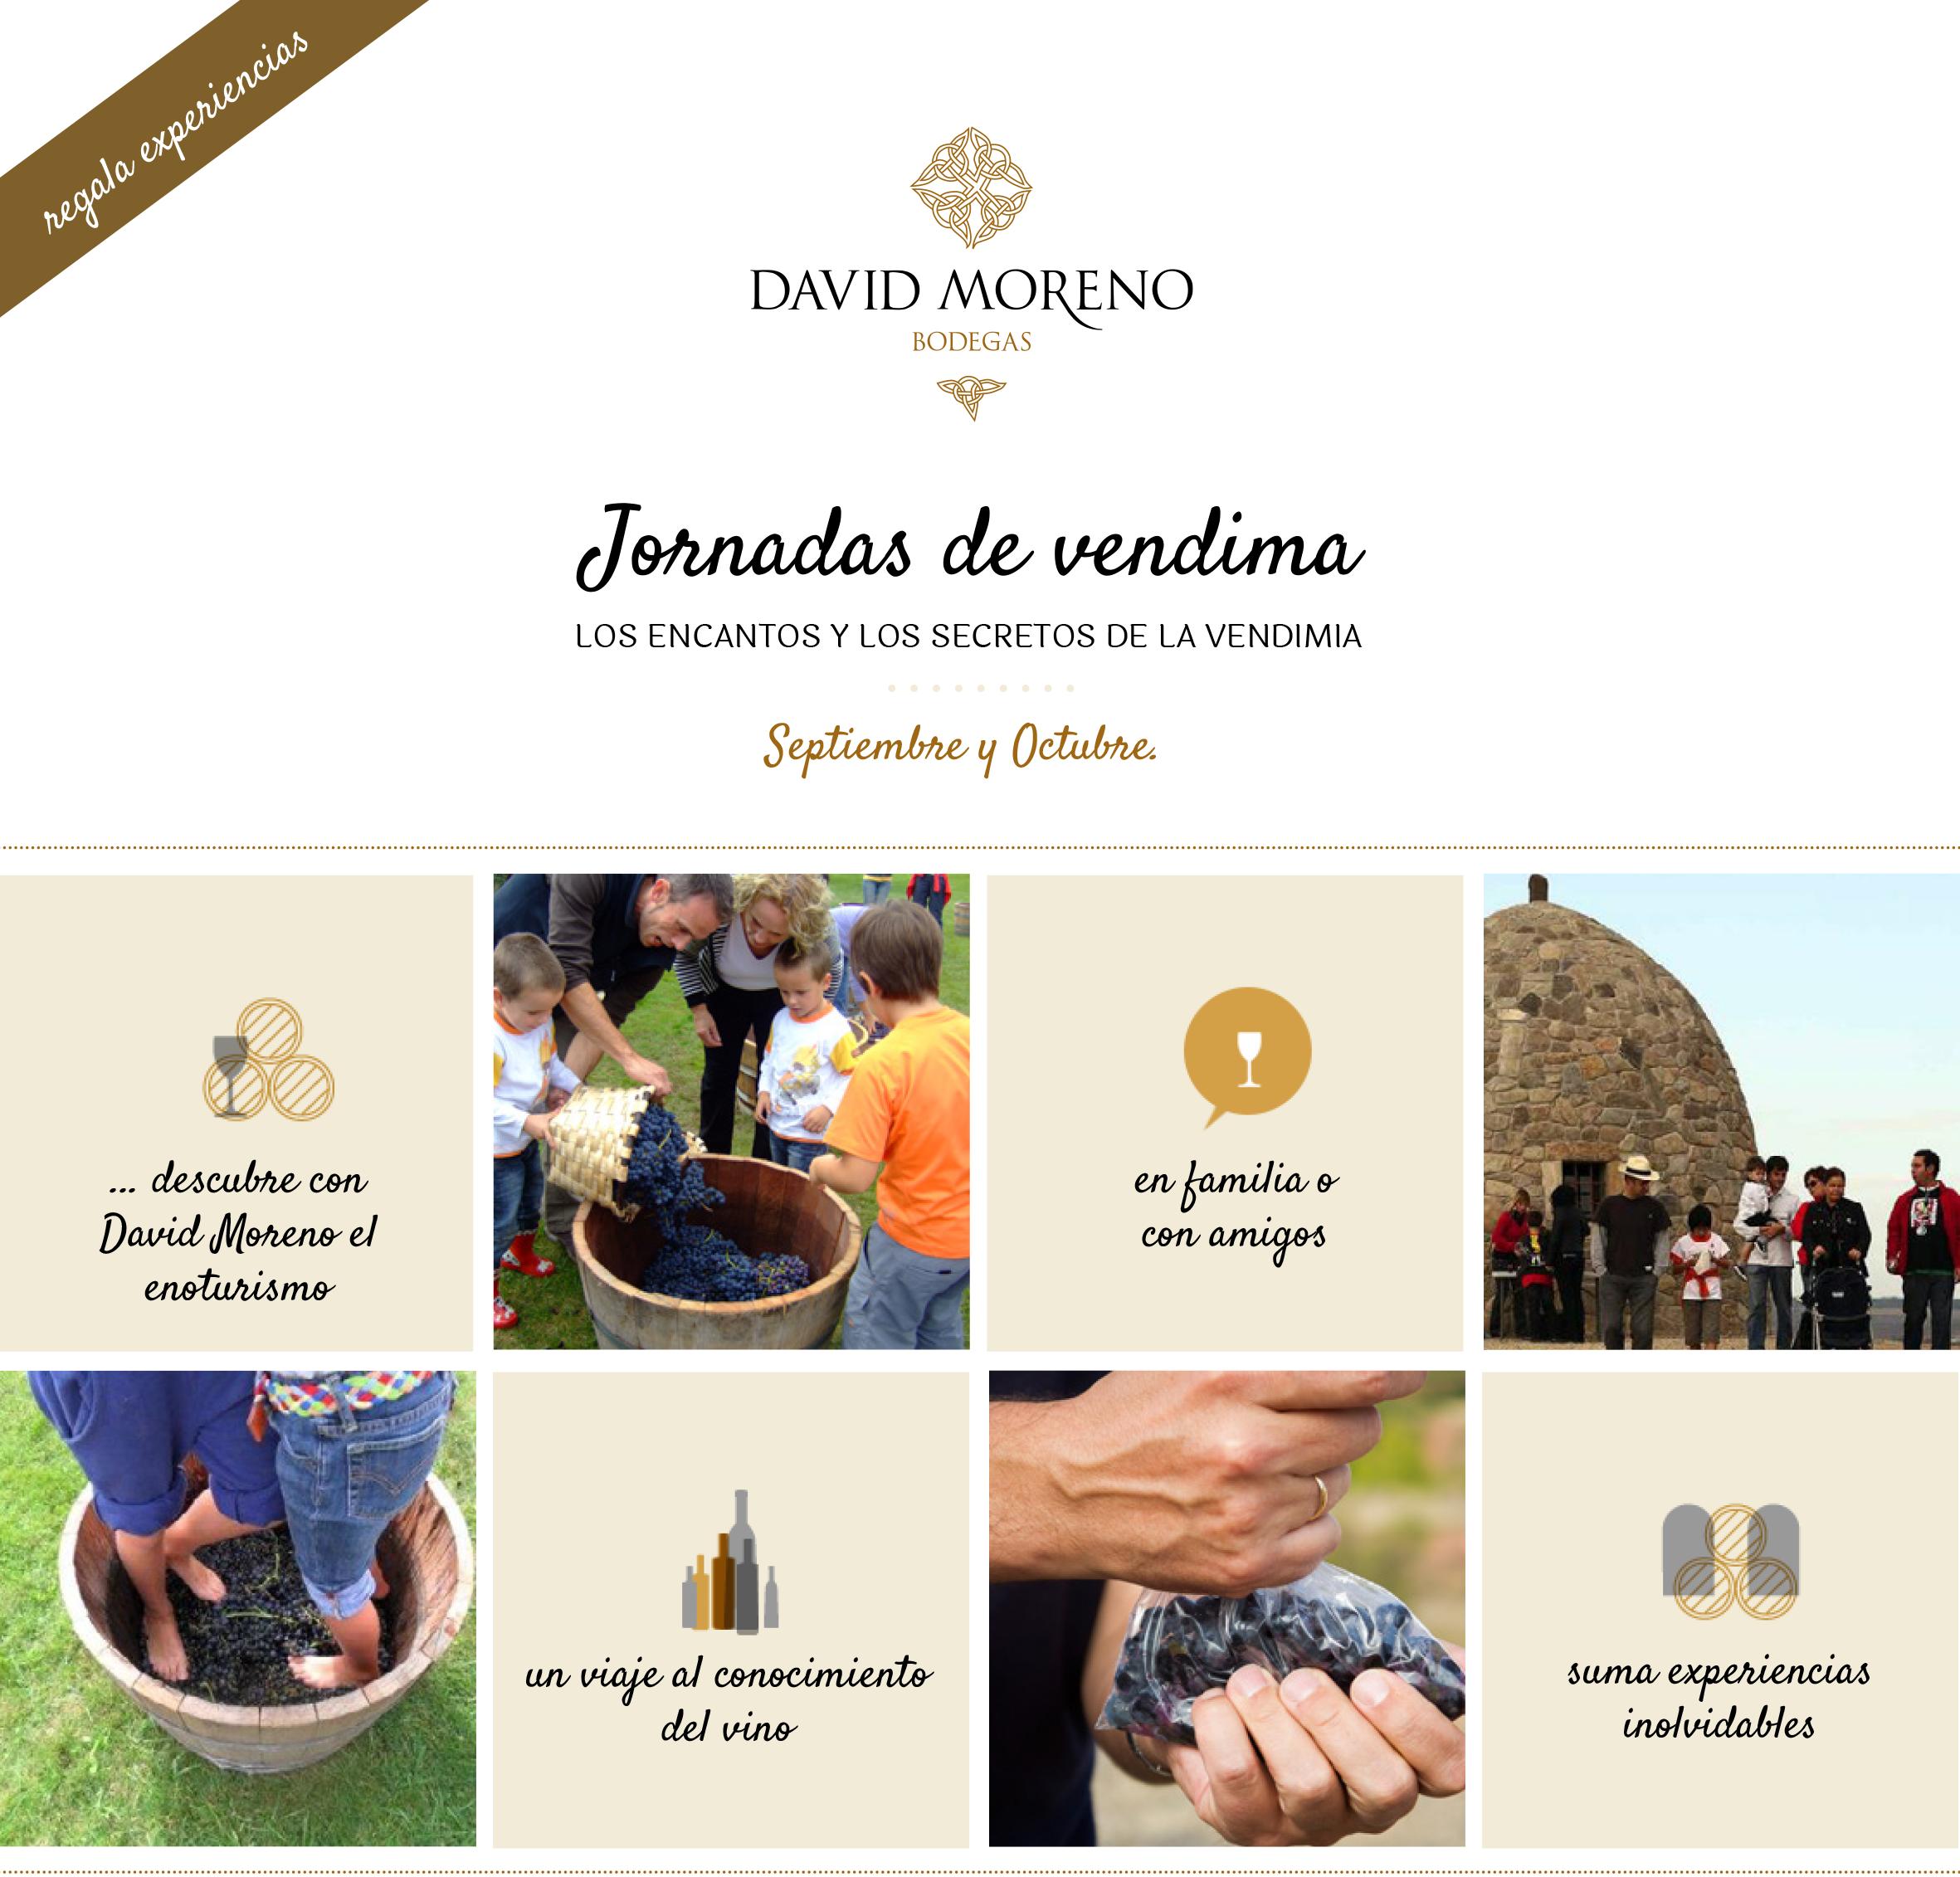 Jornadas de vendimia en Bodegas David Moreno. - Vinos tintos ...